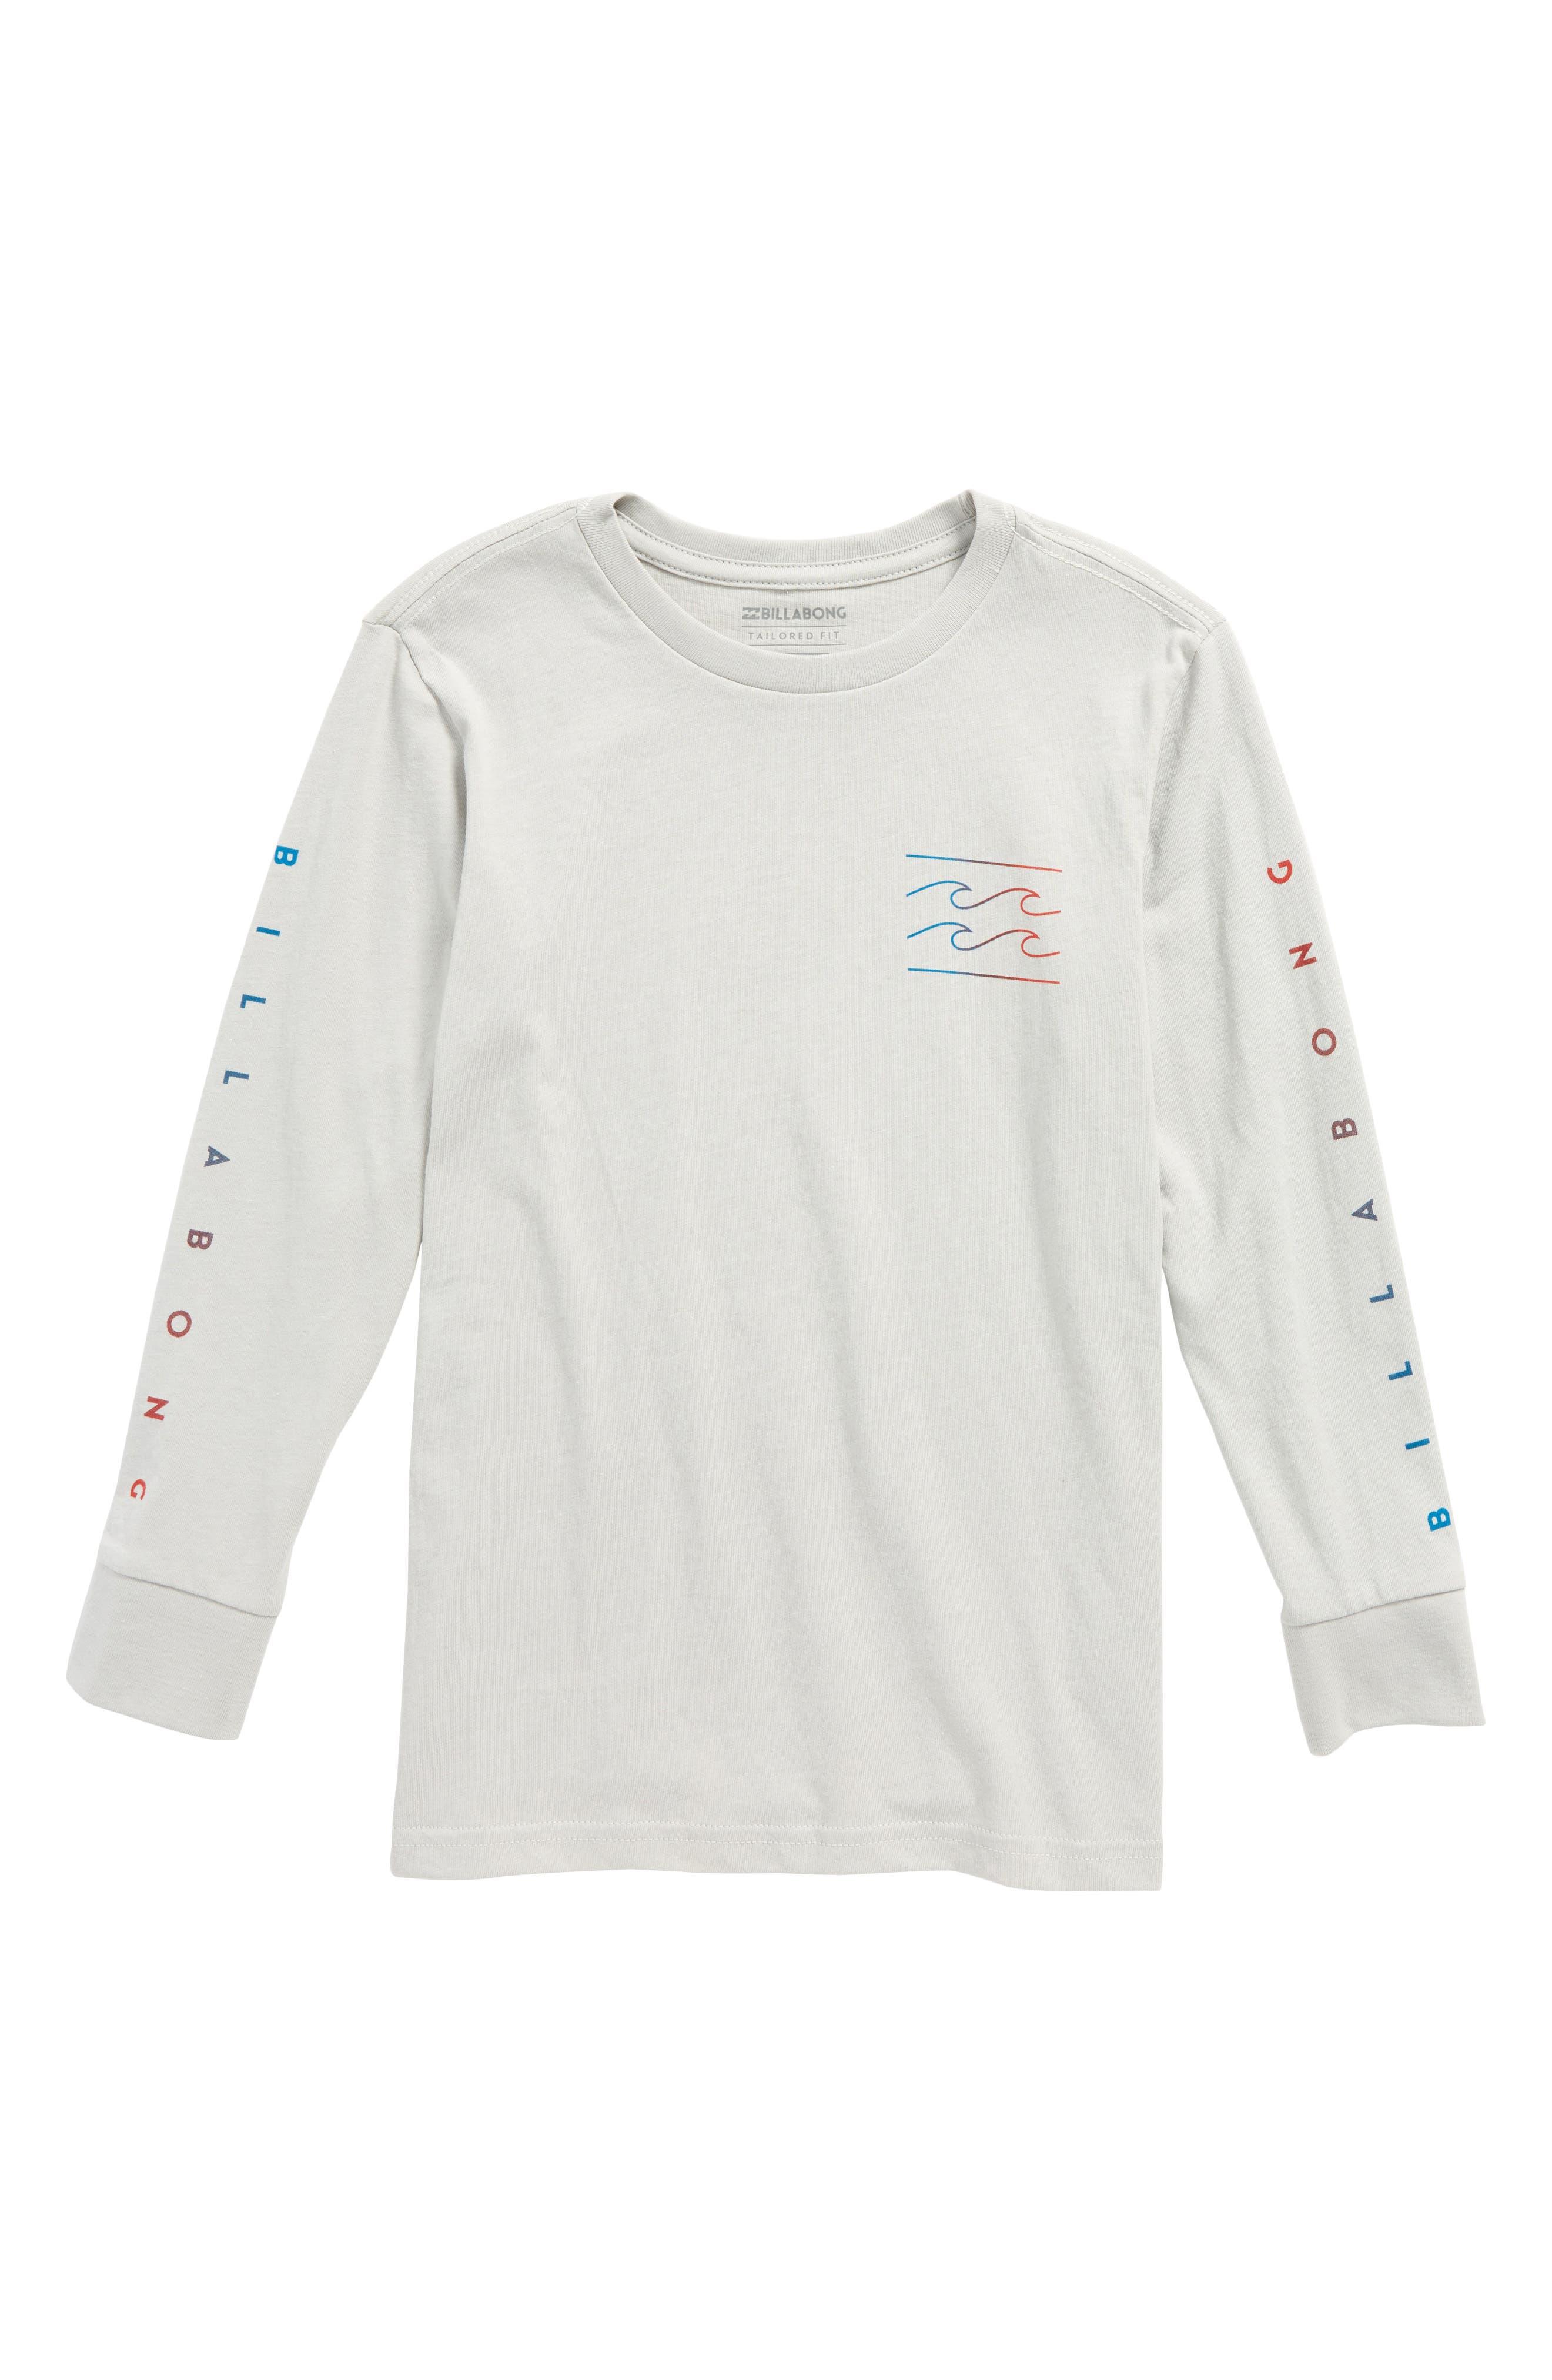 Alternate Image 1 Selected - Billabong Unity Graphic Long Sleeve T-Shirt (Toddler Boys & Little Boys)